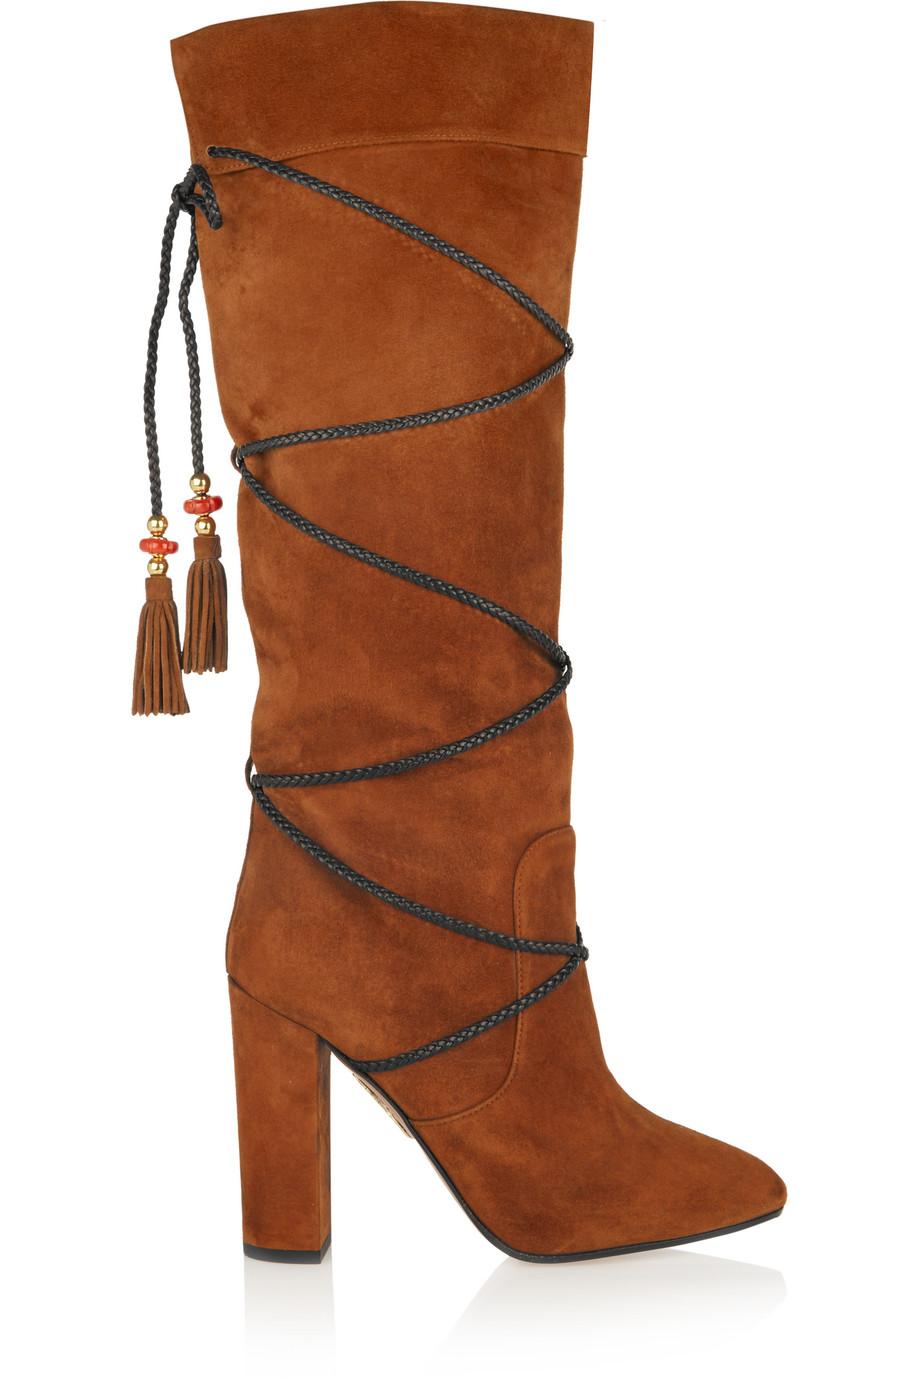 Aquazzura + Poppy Delevingne Moonshine Suede Knee Boots, Tan, Women's US Size: 8.5, Size: 39